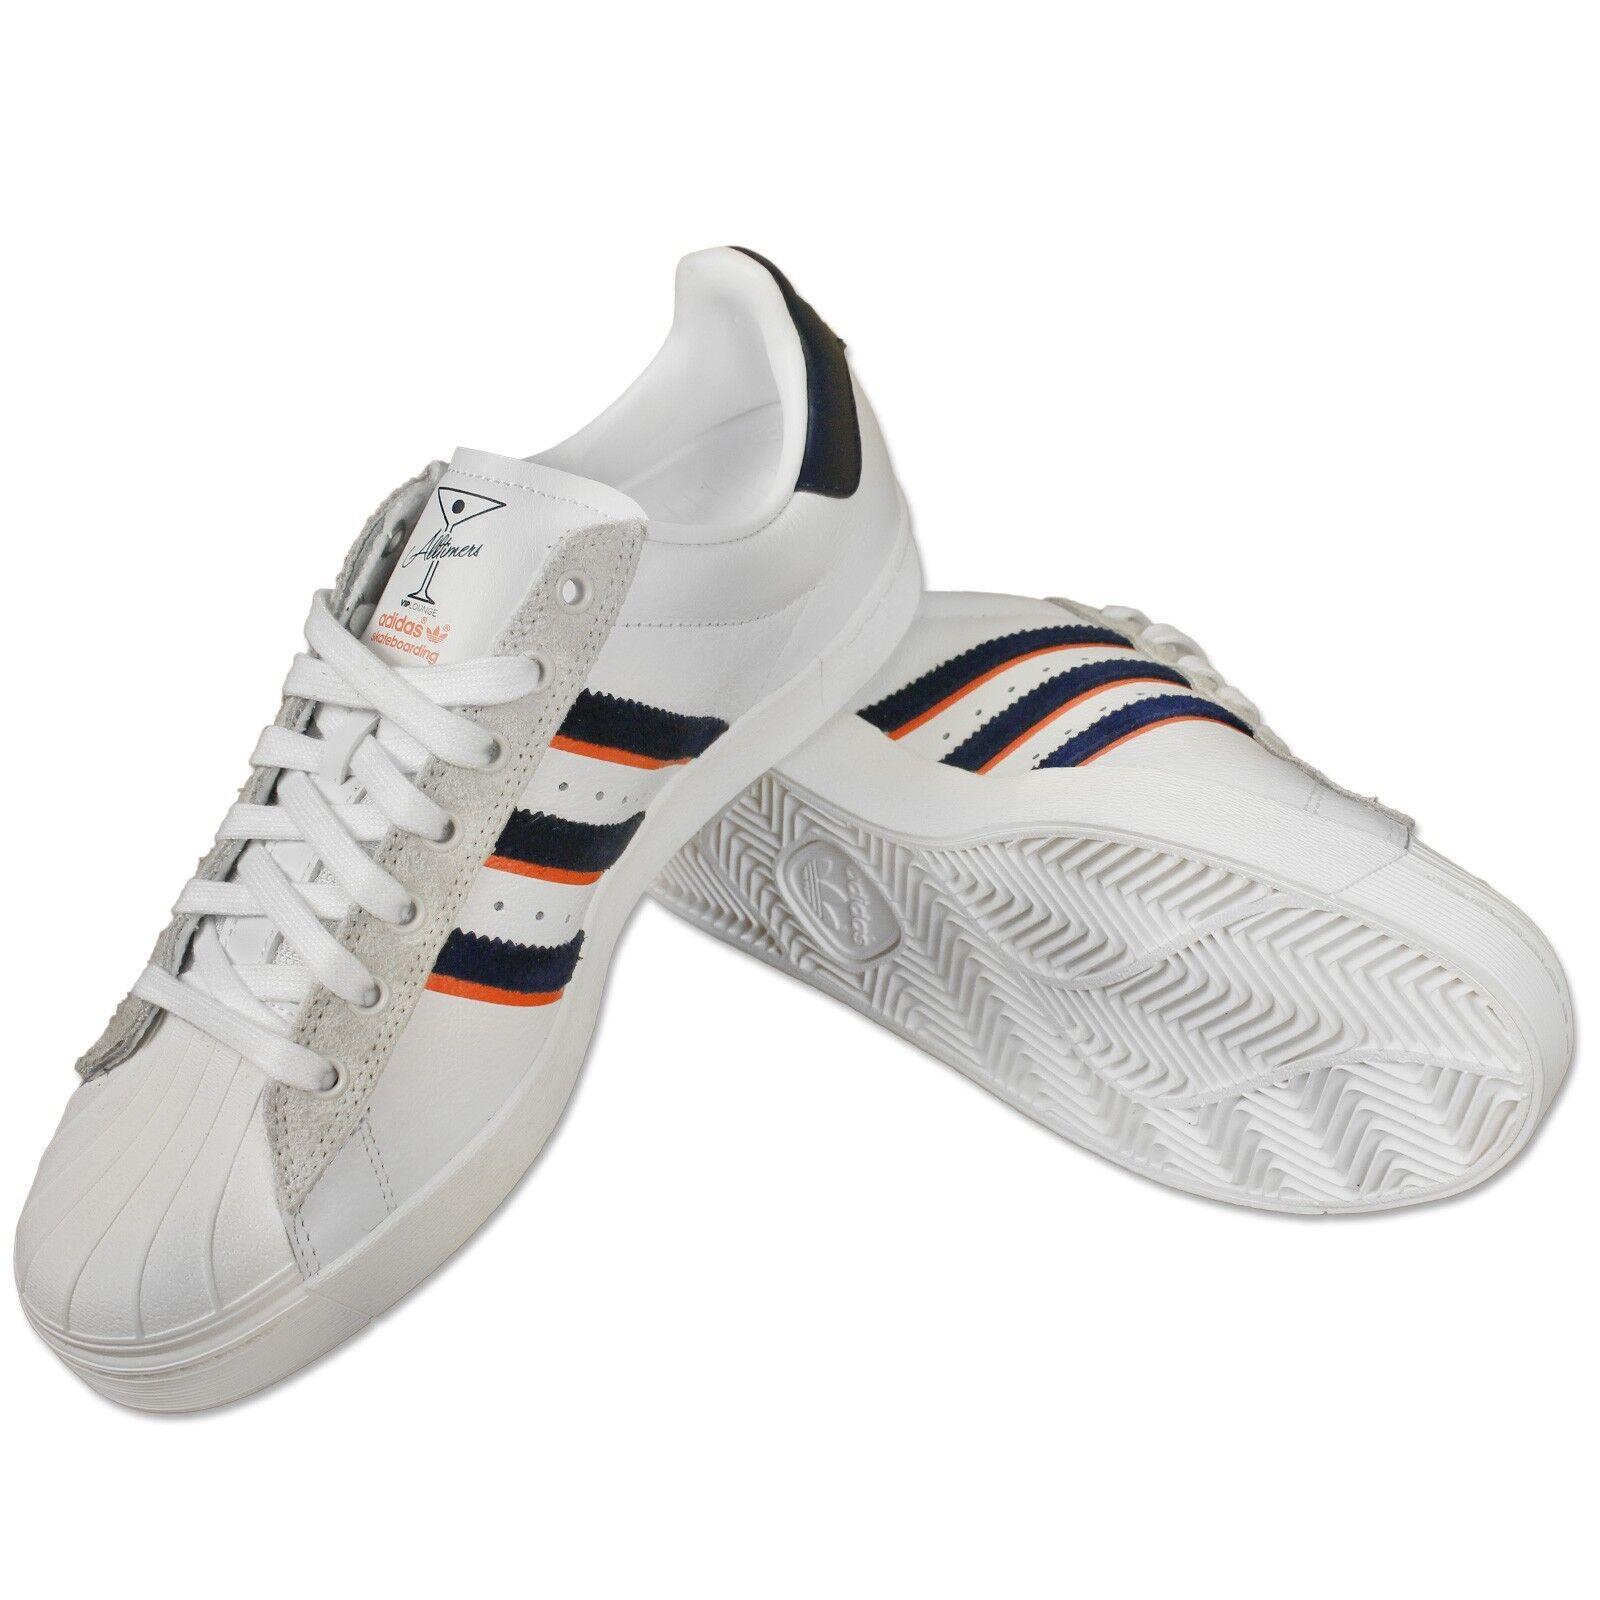 Basket '80 Adidas Super Star Années '80 Basket 975293